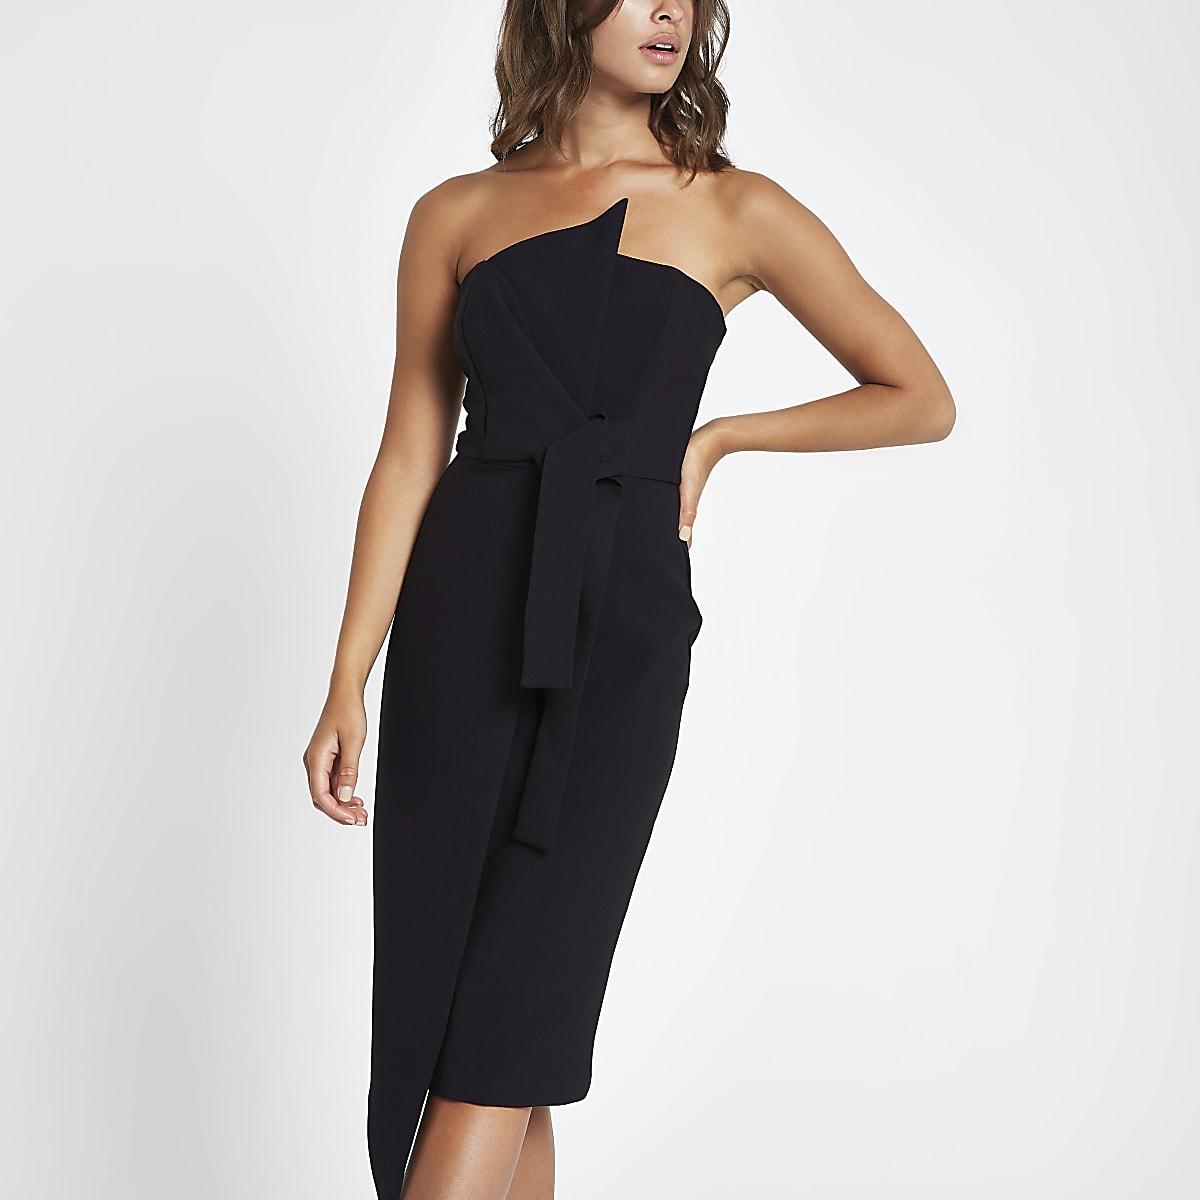 4be17e06a2 Black bandeau bodycon midi dress - Wedding Guest Dresses   Outfits ...